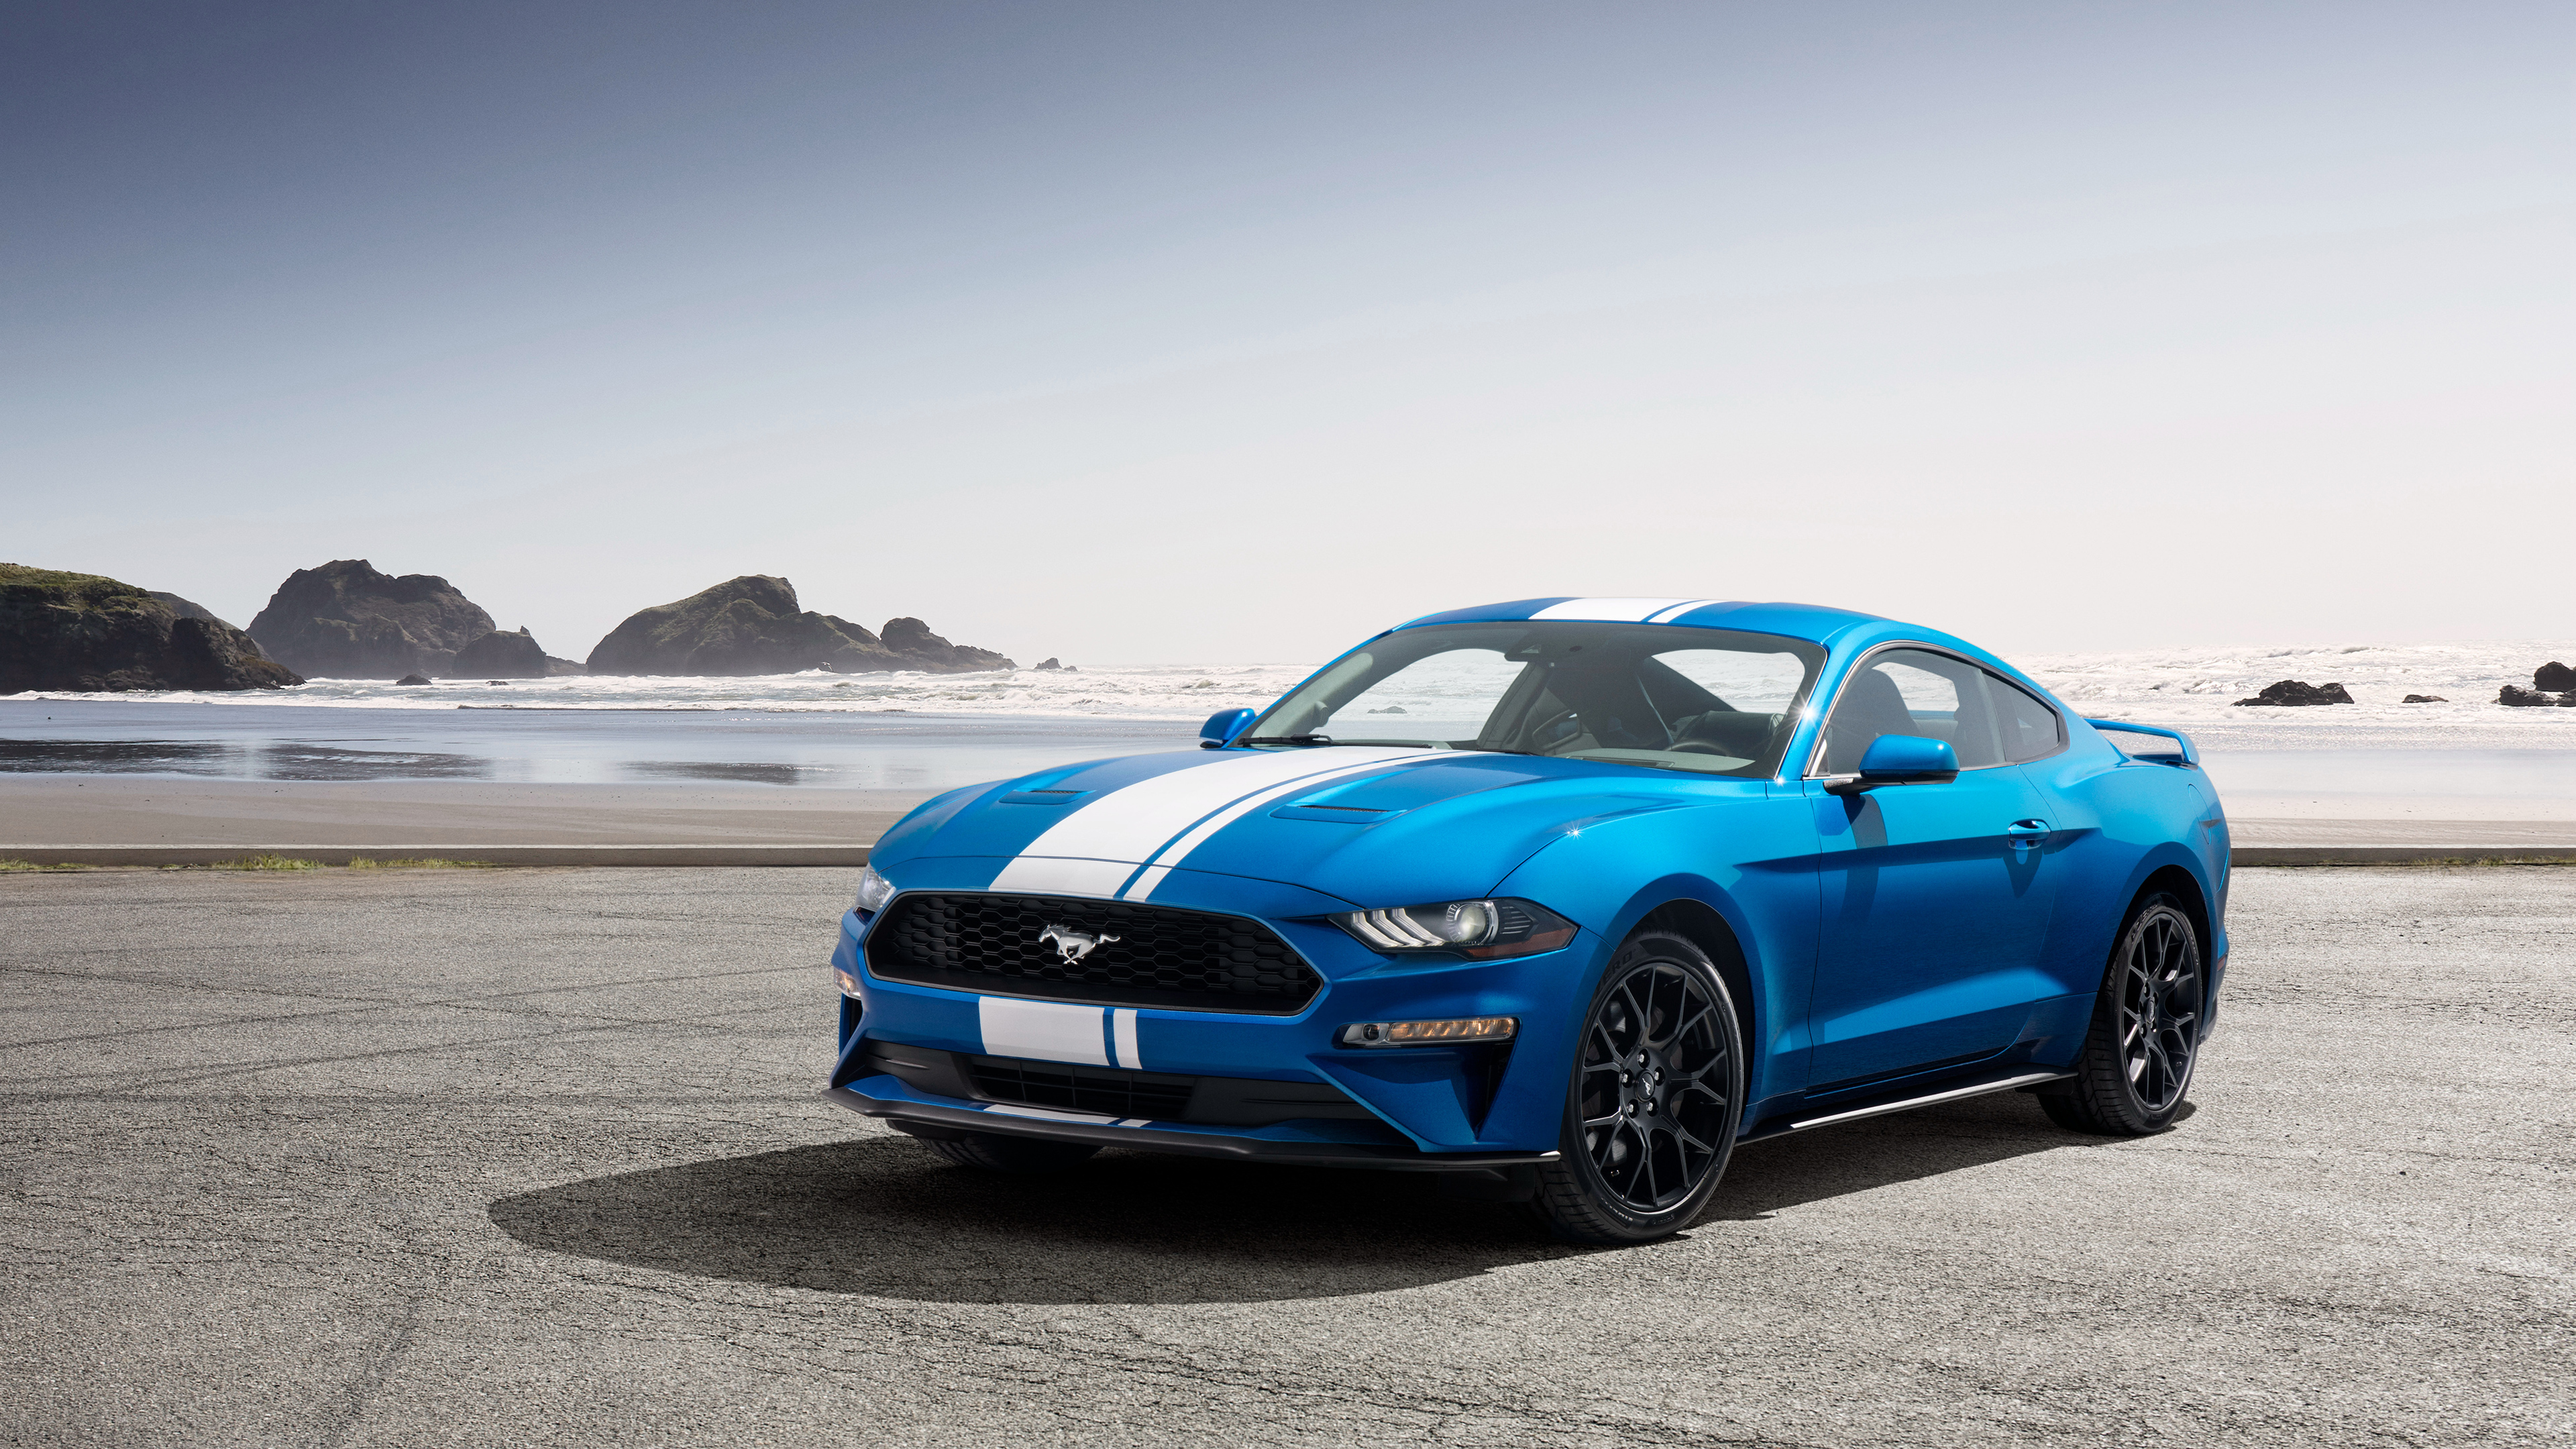 Mustang Gt500 Wallpaper 4K